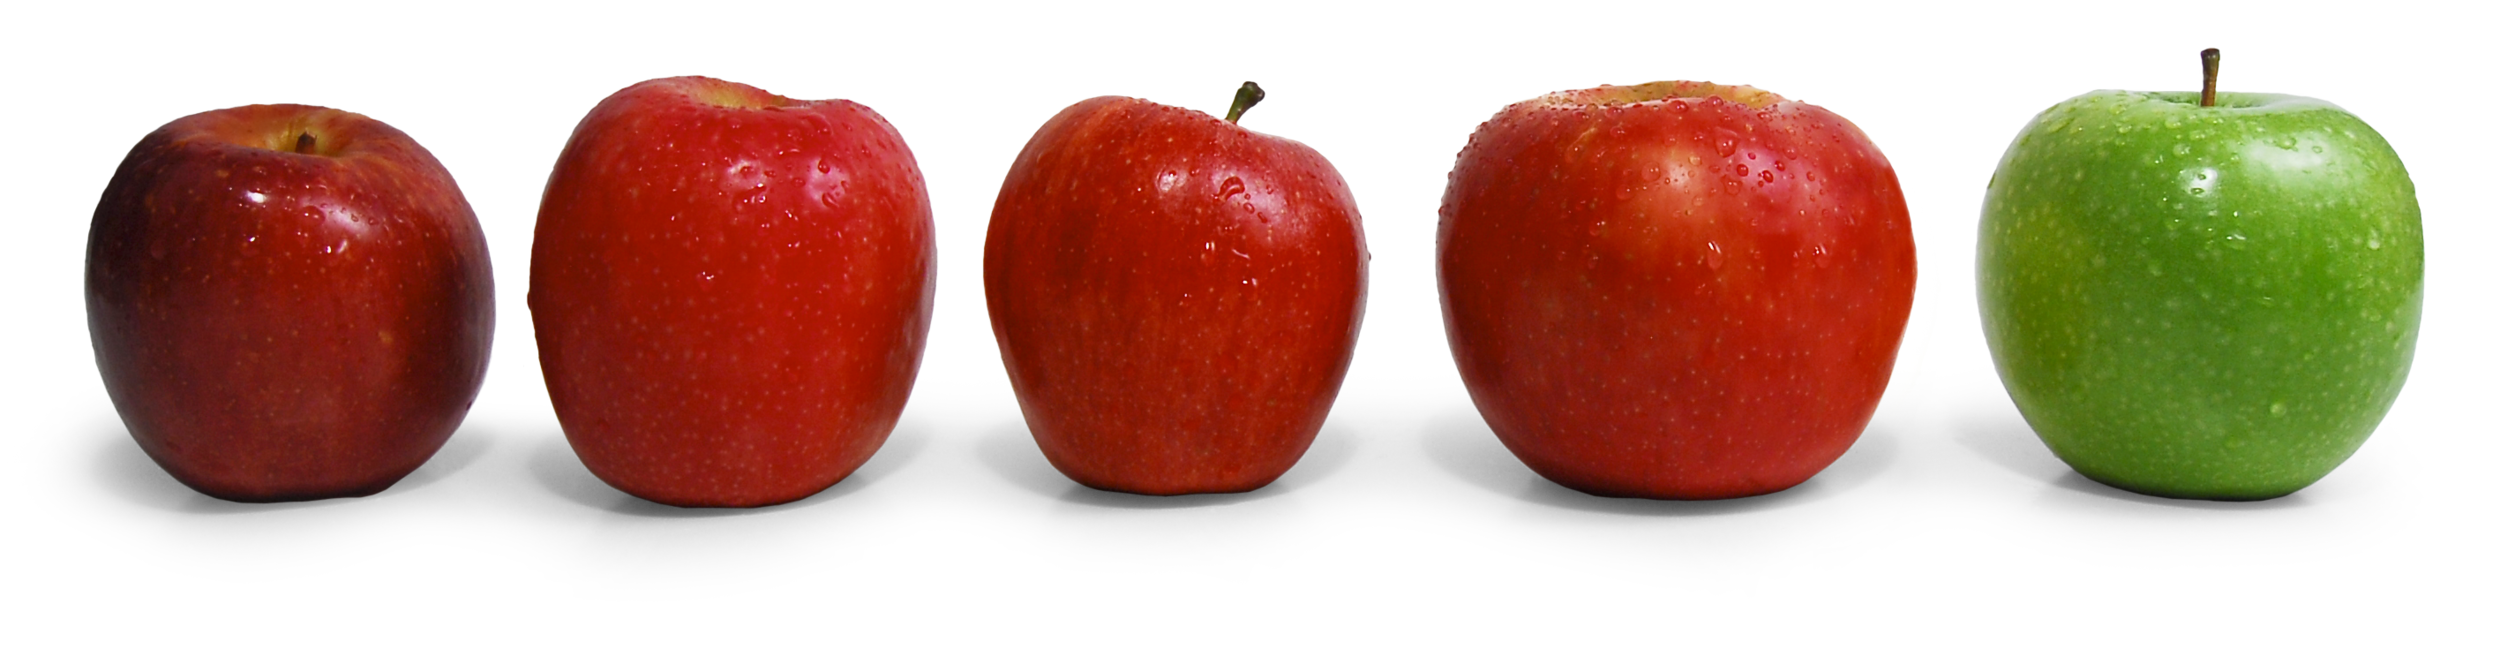 auvil-fruit-apples.png